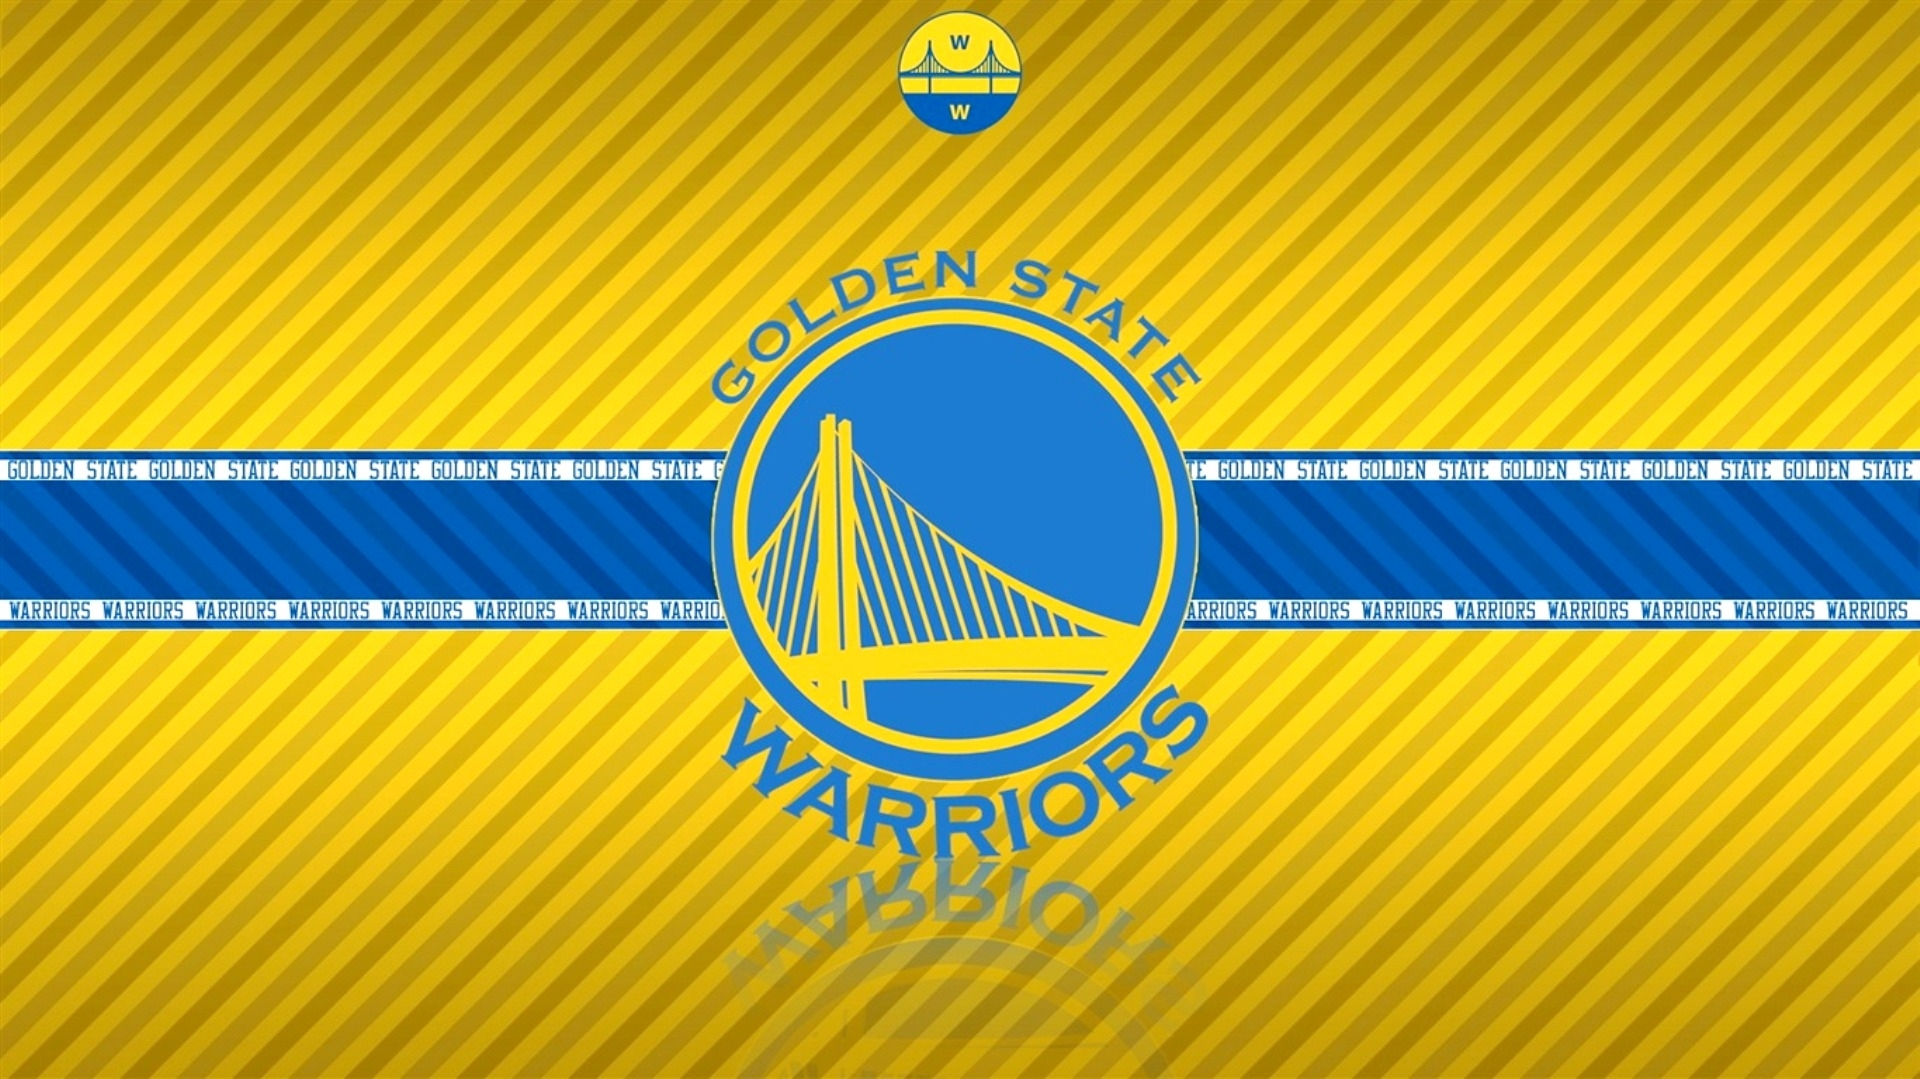 10 Best Golden State Warriors Wallpaper 2016 FULL HD 1080p For PC Desktop